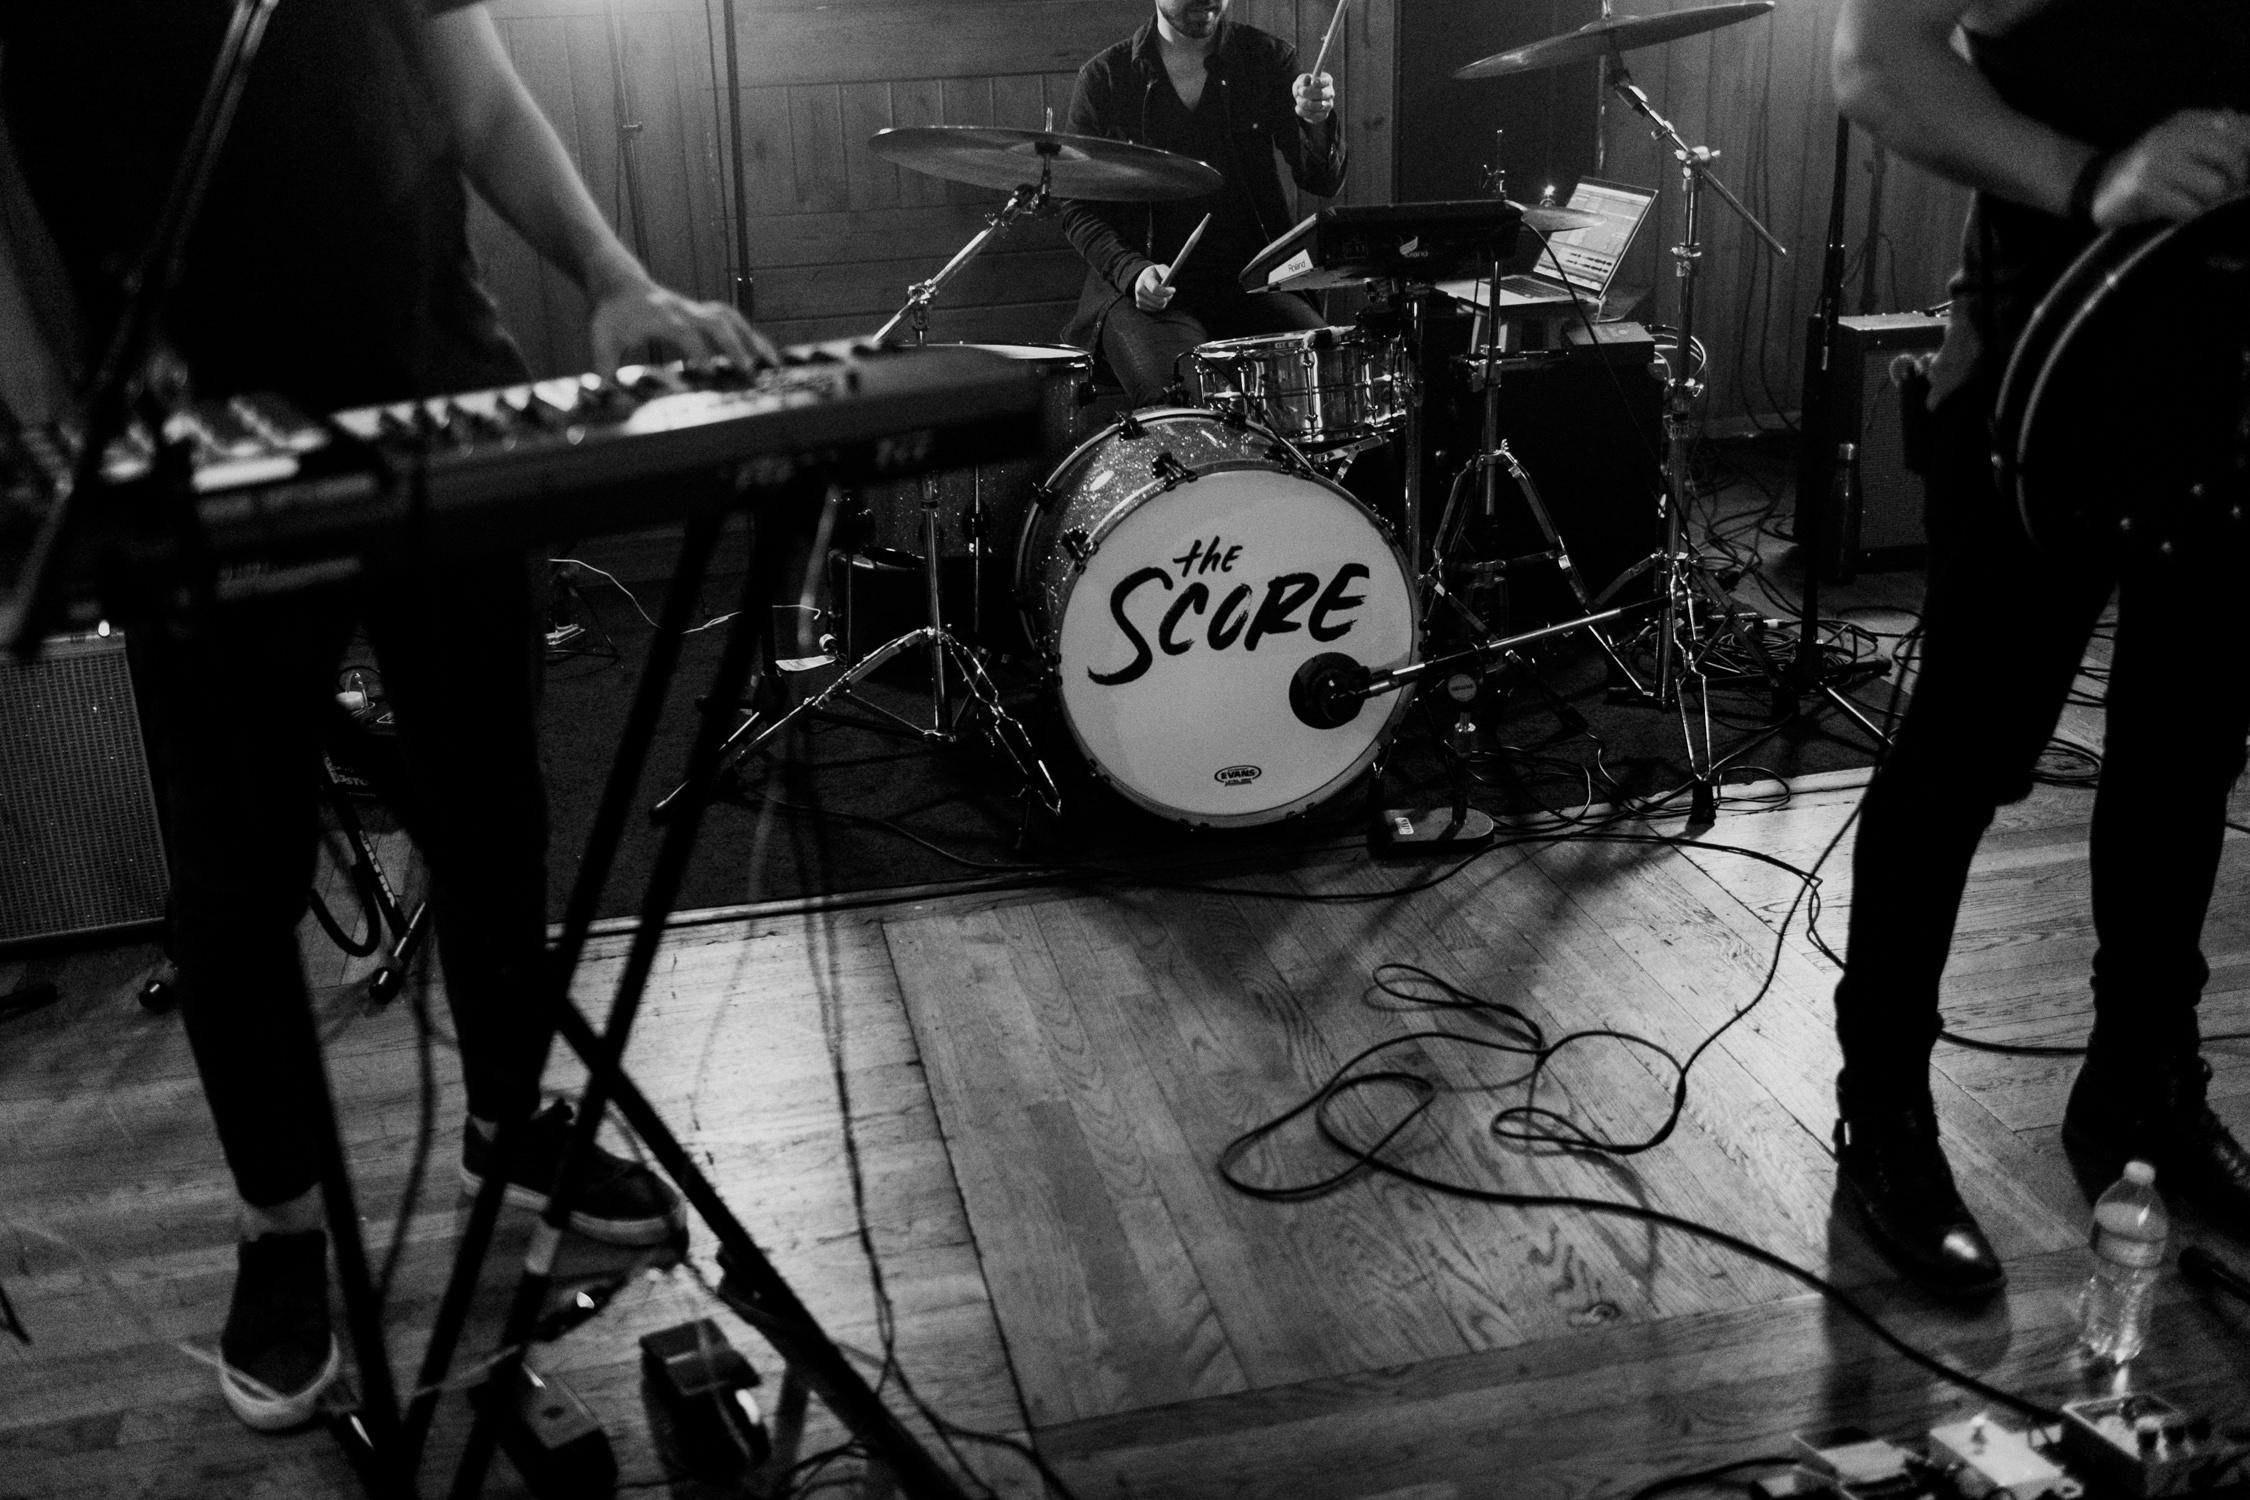 the-score-music-video-AnnaLeeMedia